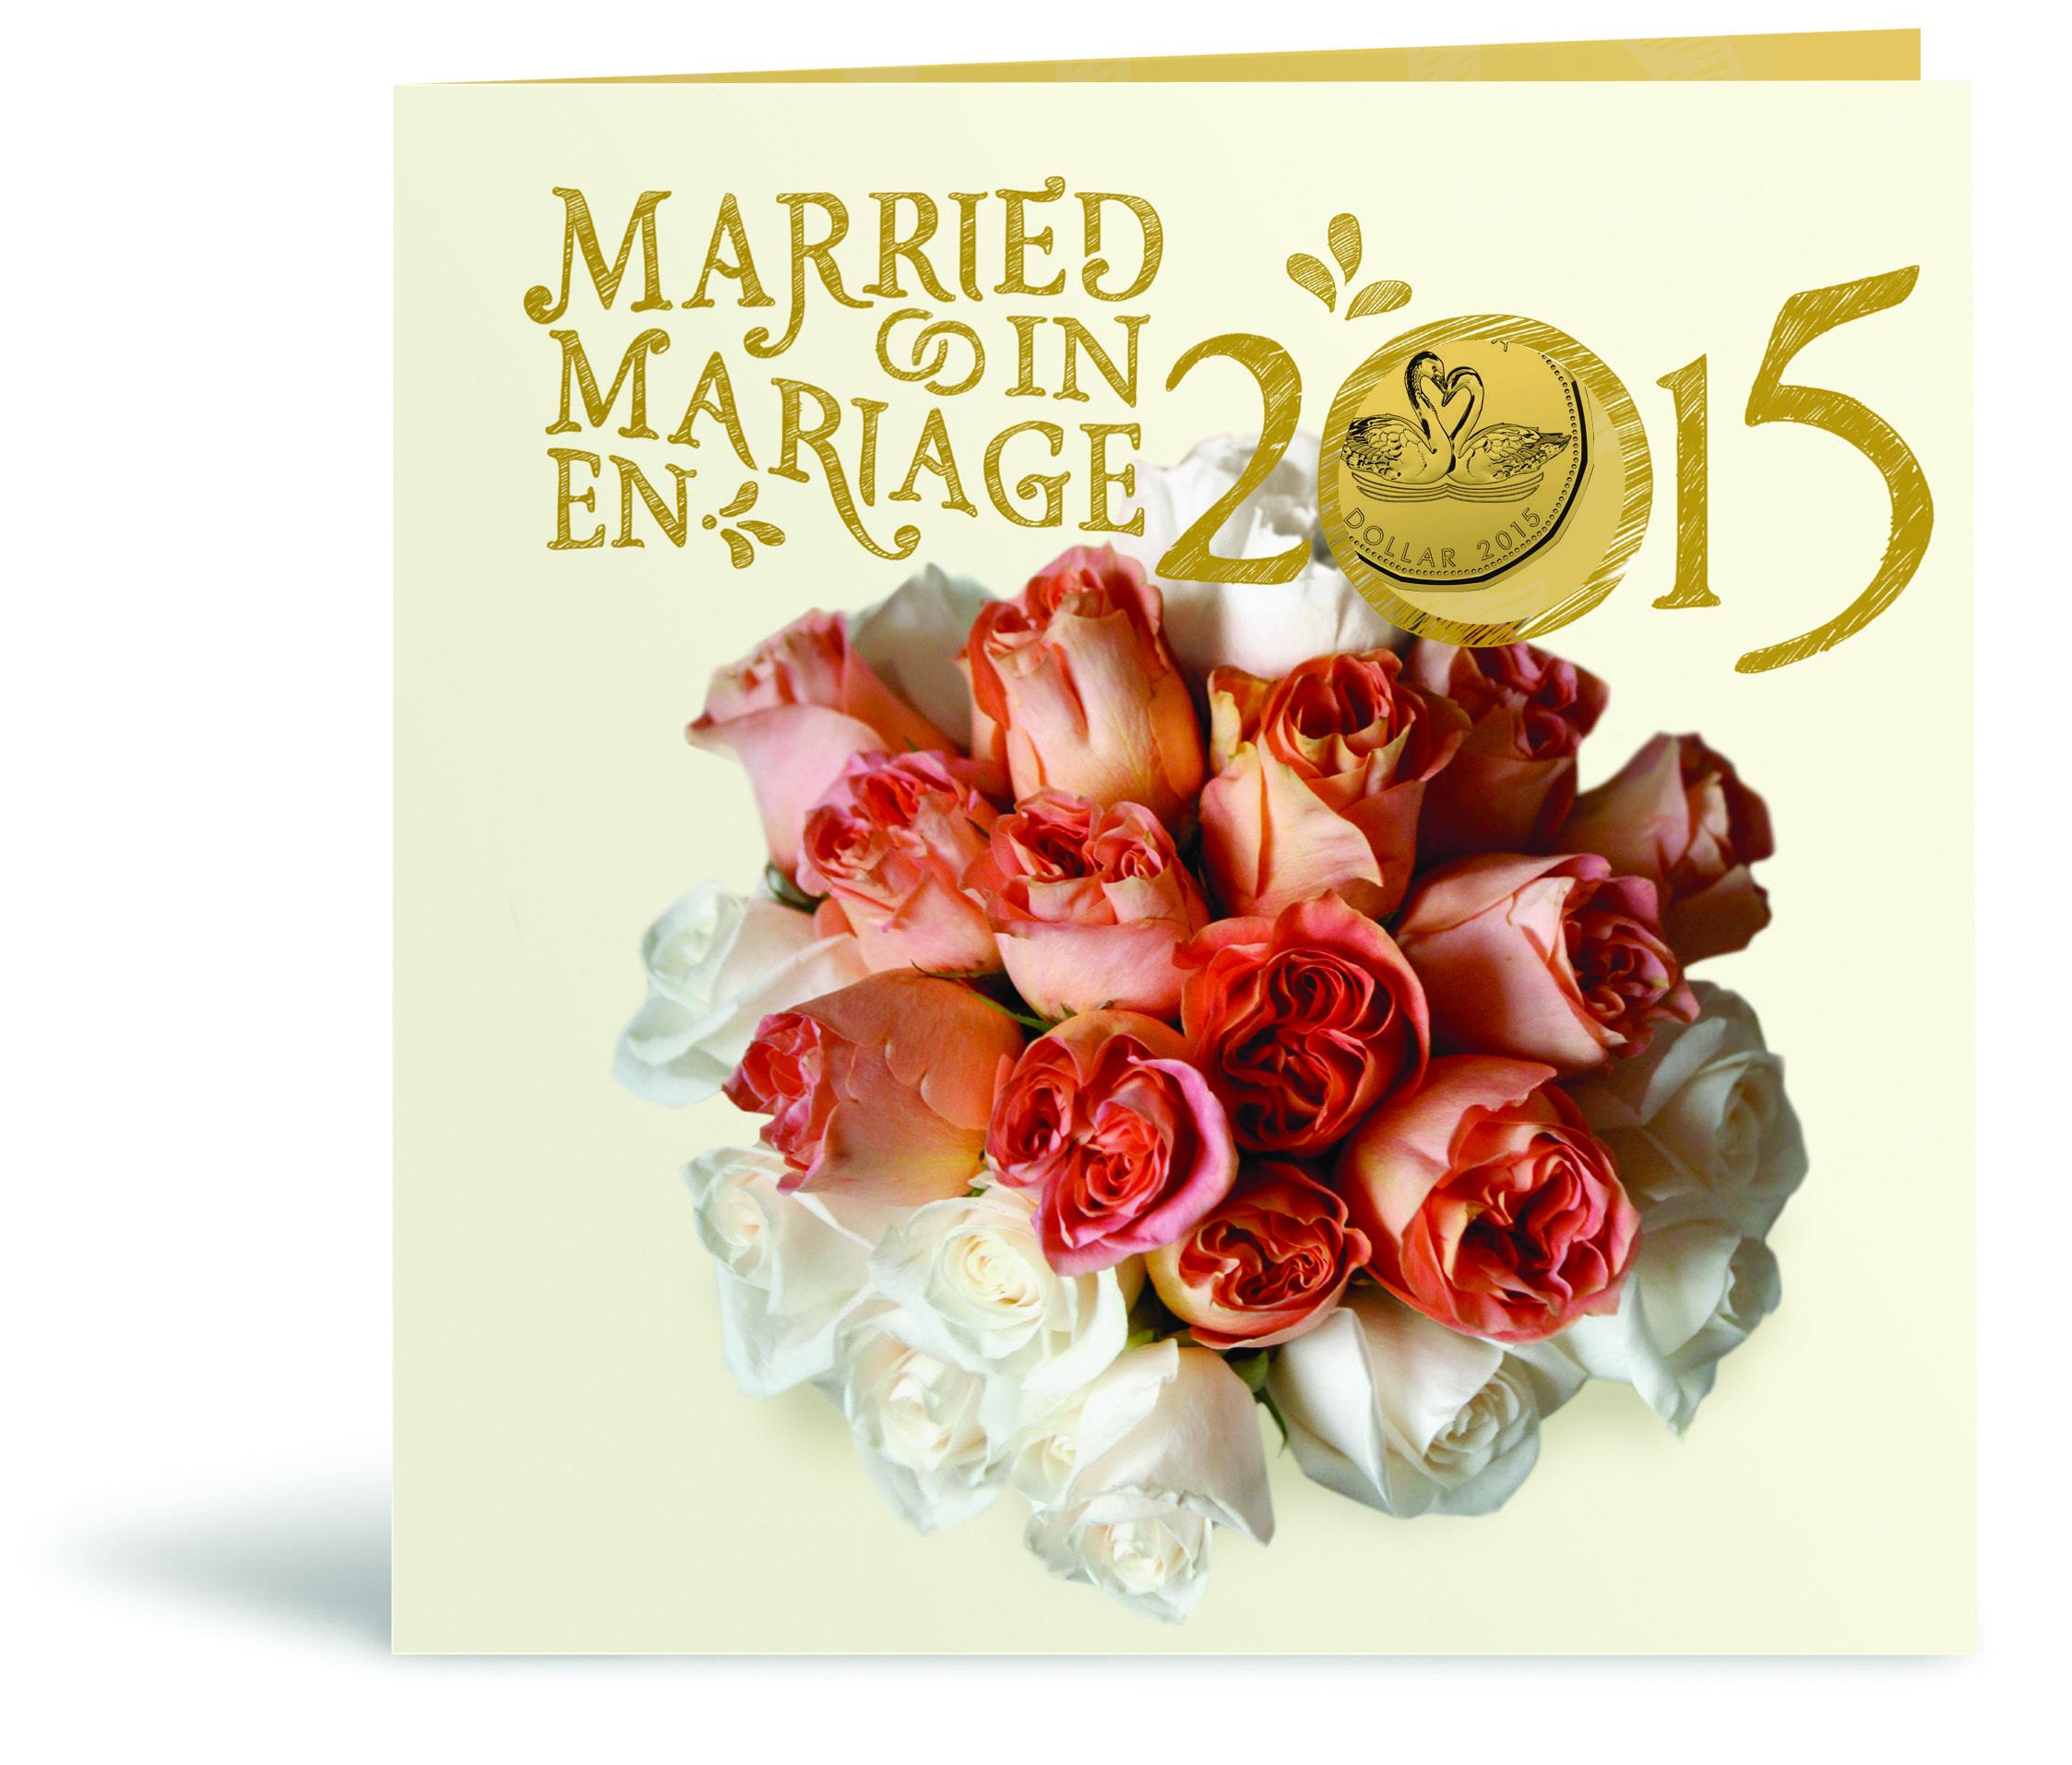 Wedding Gift Set (2015) Wedding gift set, Wedding gifts